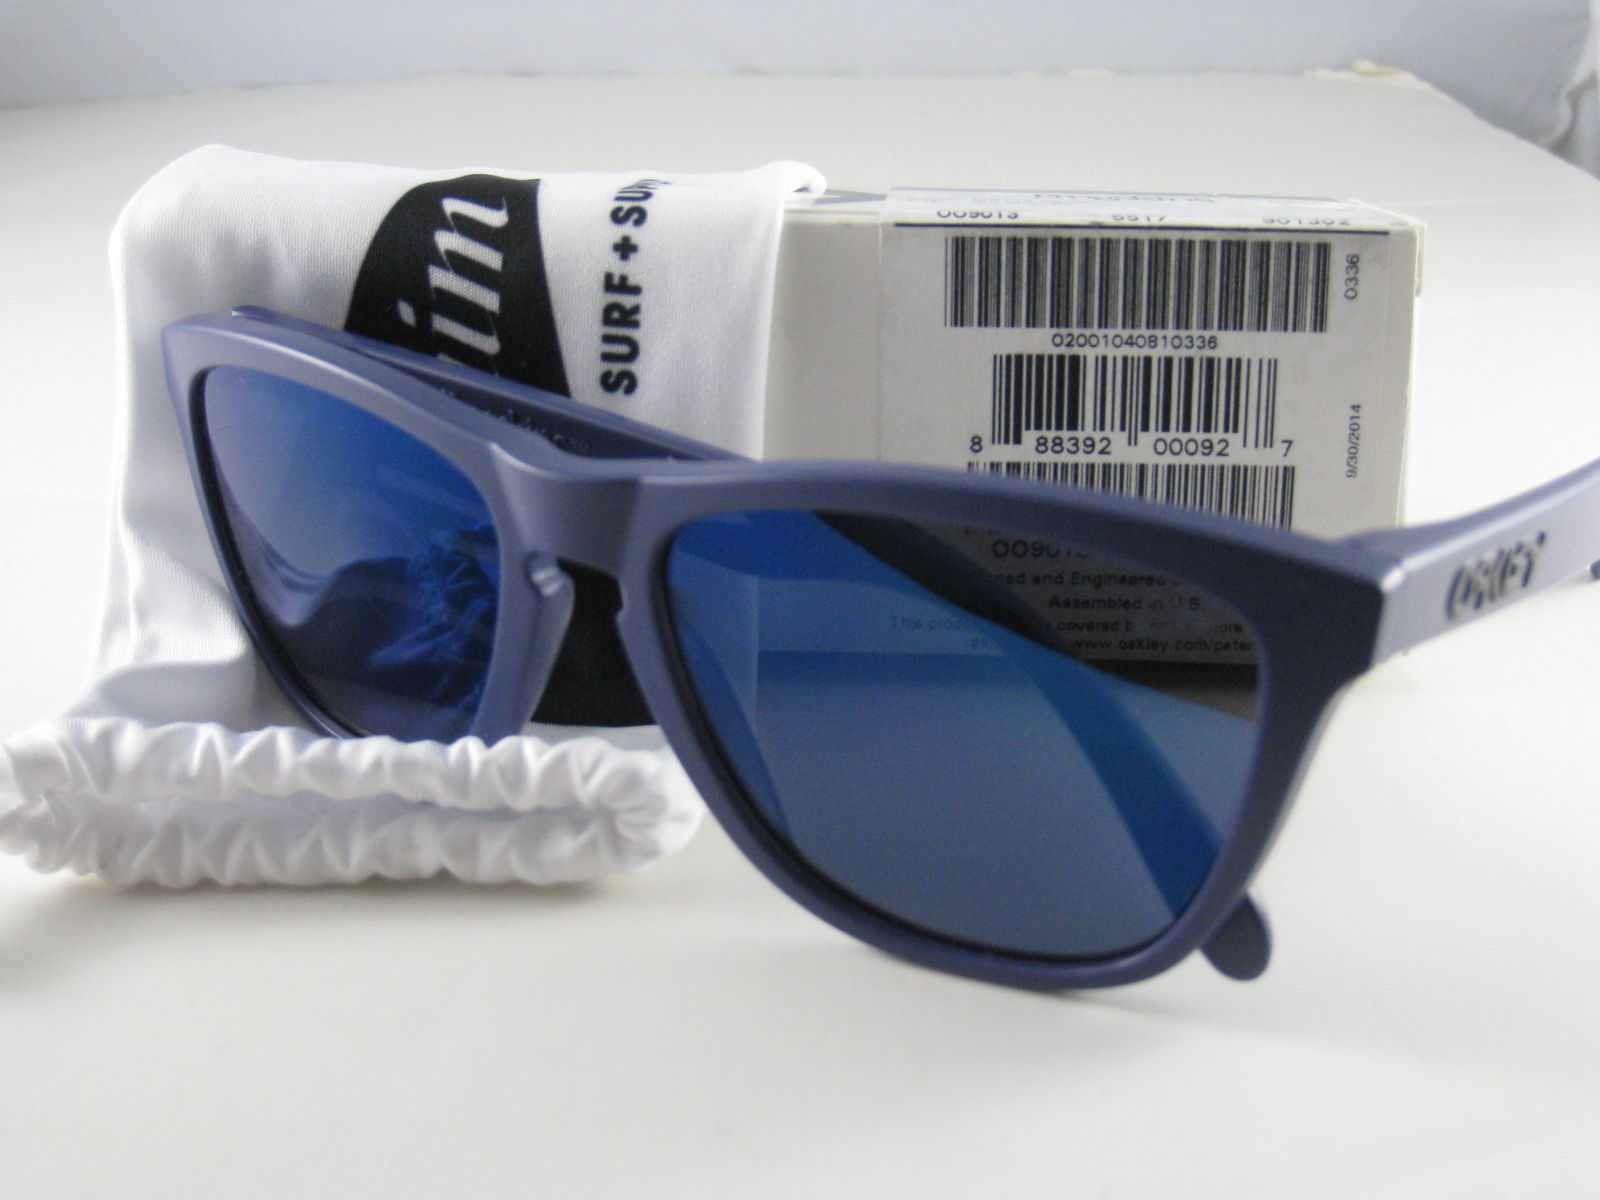 Oakley Frogskins Edición Limitada Rayos Peregrino Surf Spl Mate Azul Marino con